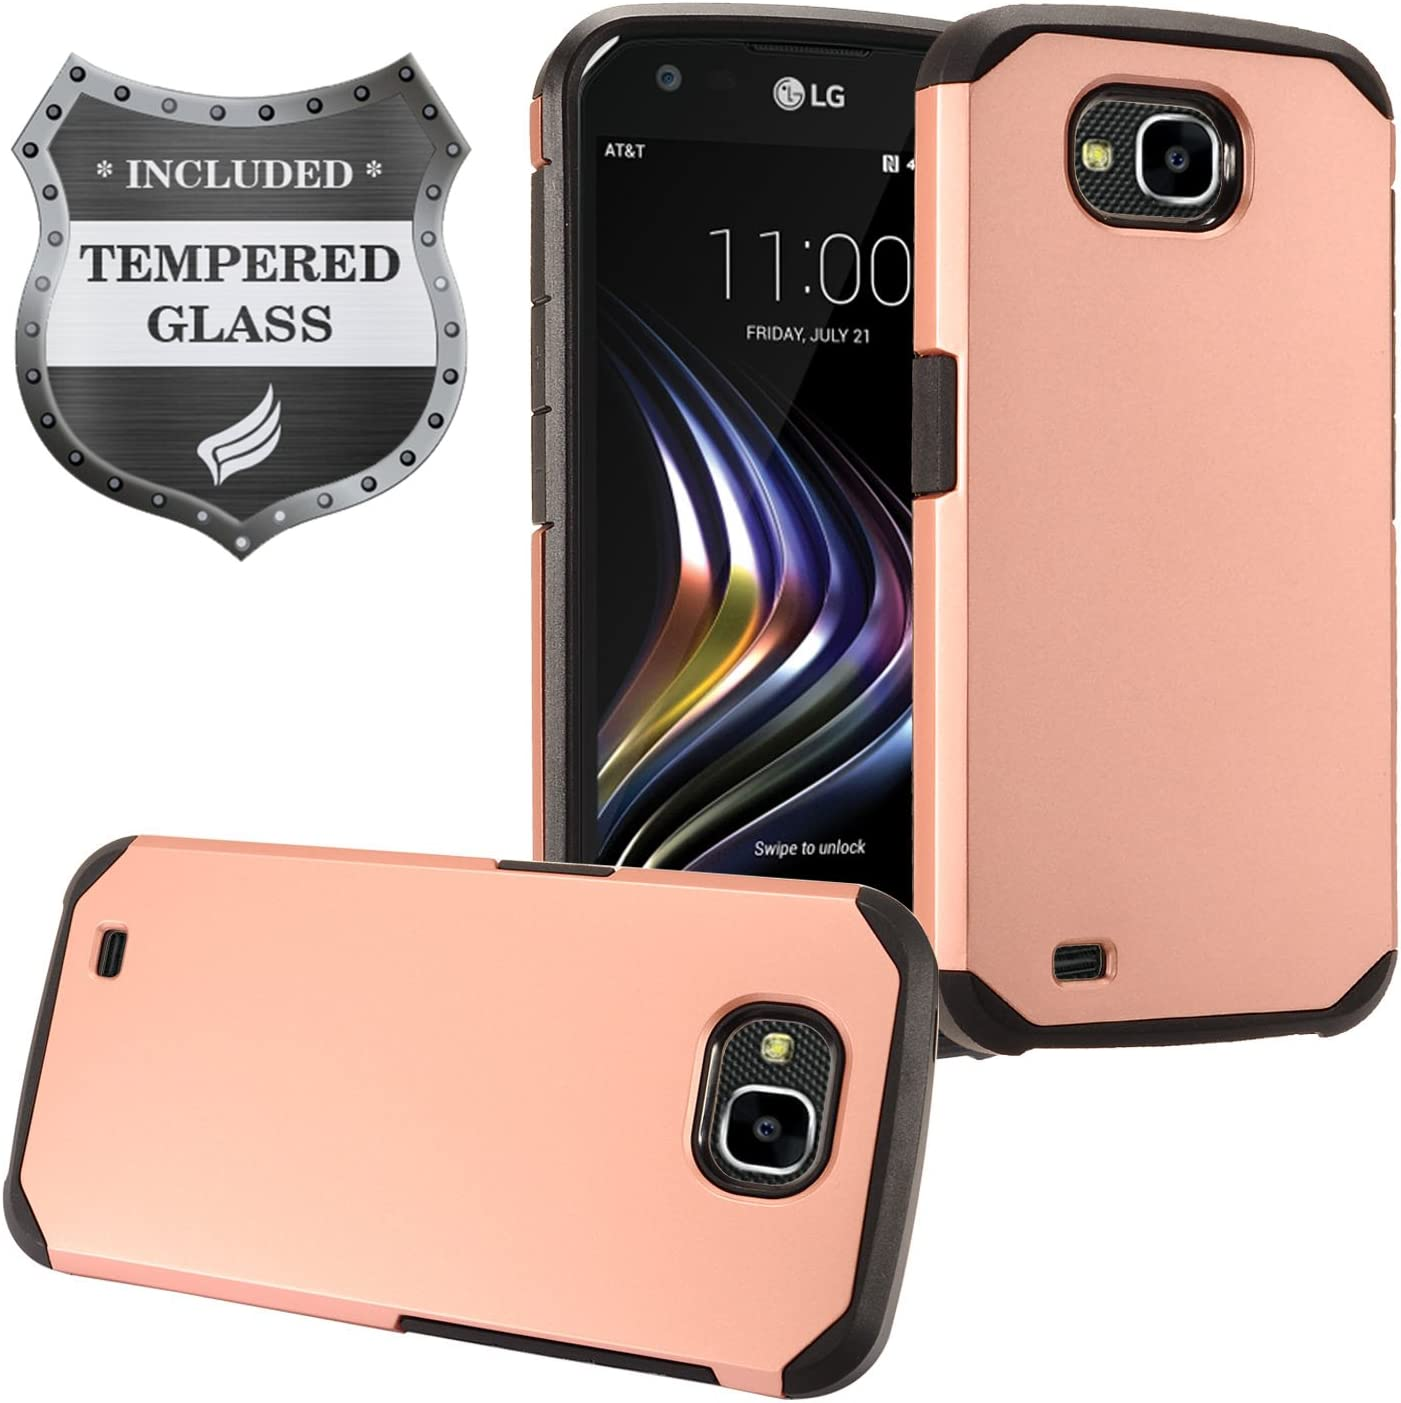 For LG X Venture M701/H700, LG X Calibur - Rubberized Hybrid Hard Case + Tempered Glass Screen Protector - Black/RoseGold